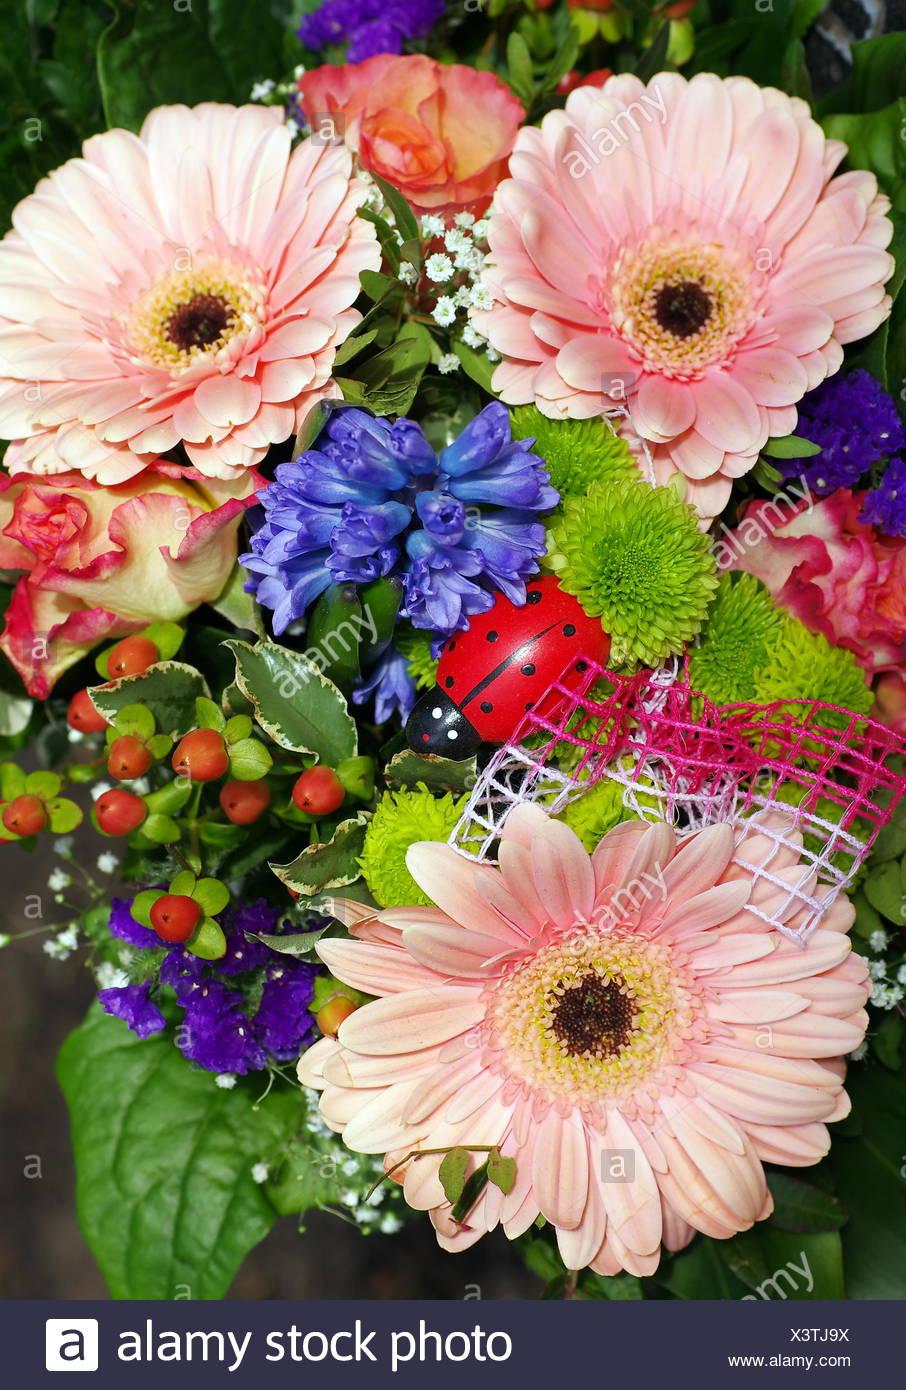 flower bouquet - Stock Image